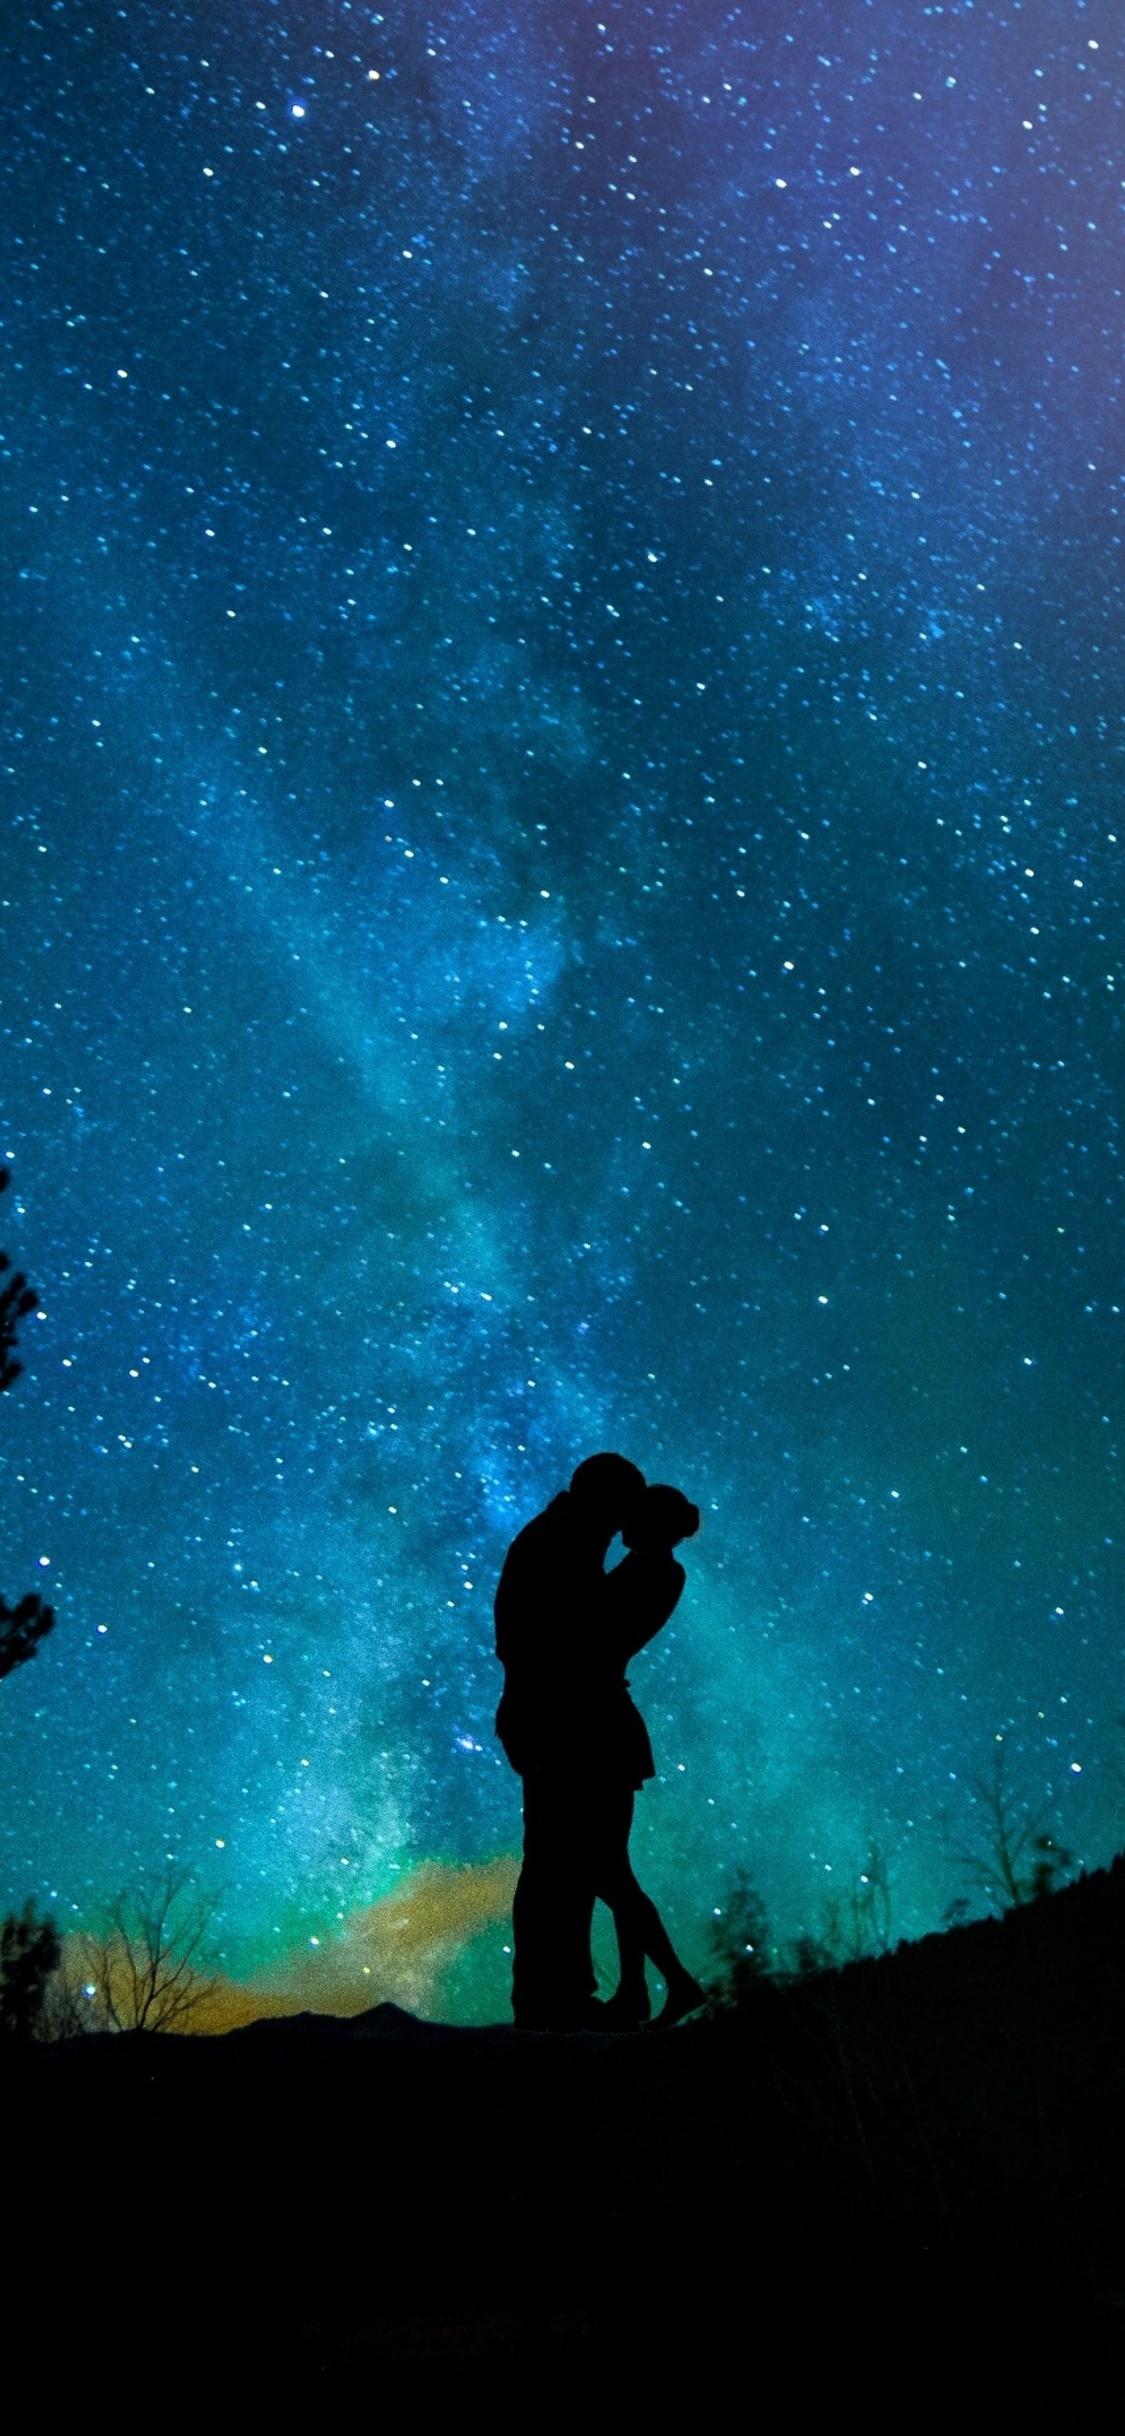 Starry Night Wallpaper Iphone X - wallpaper iphone